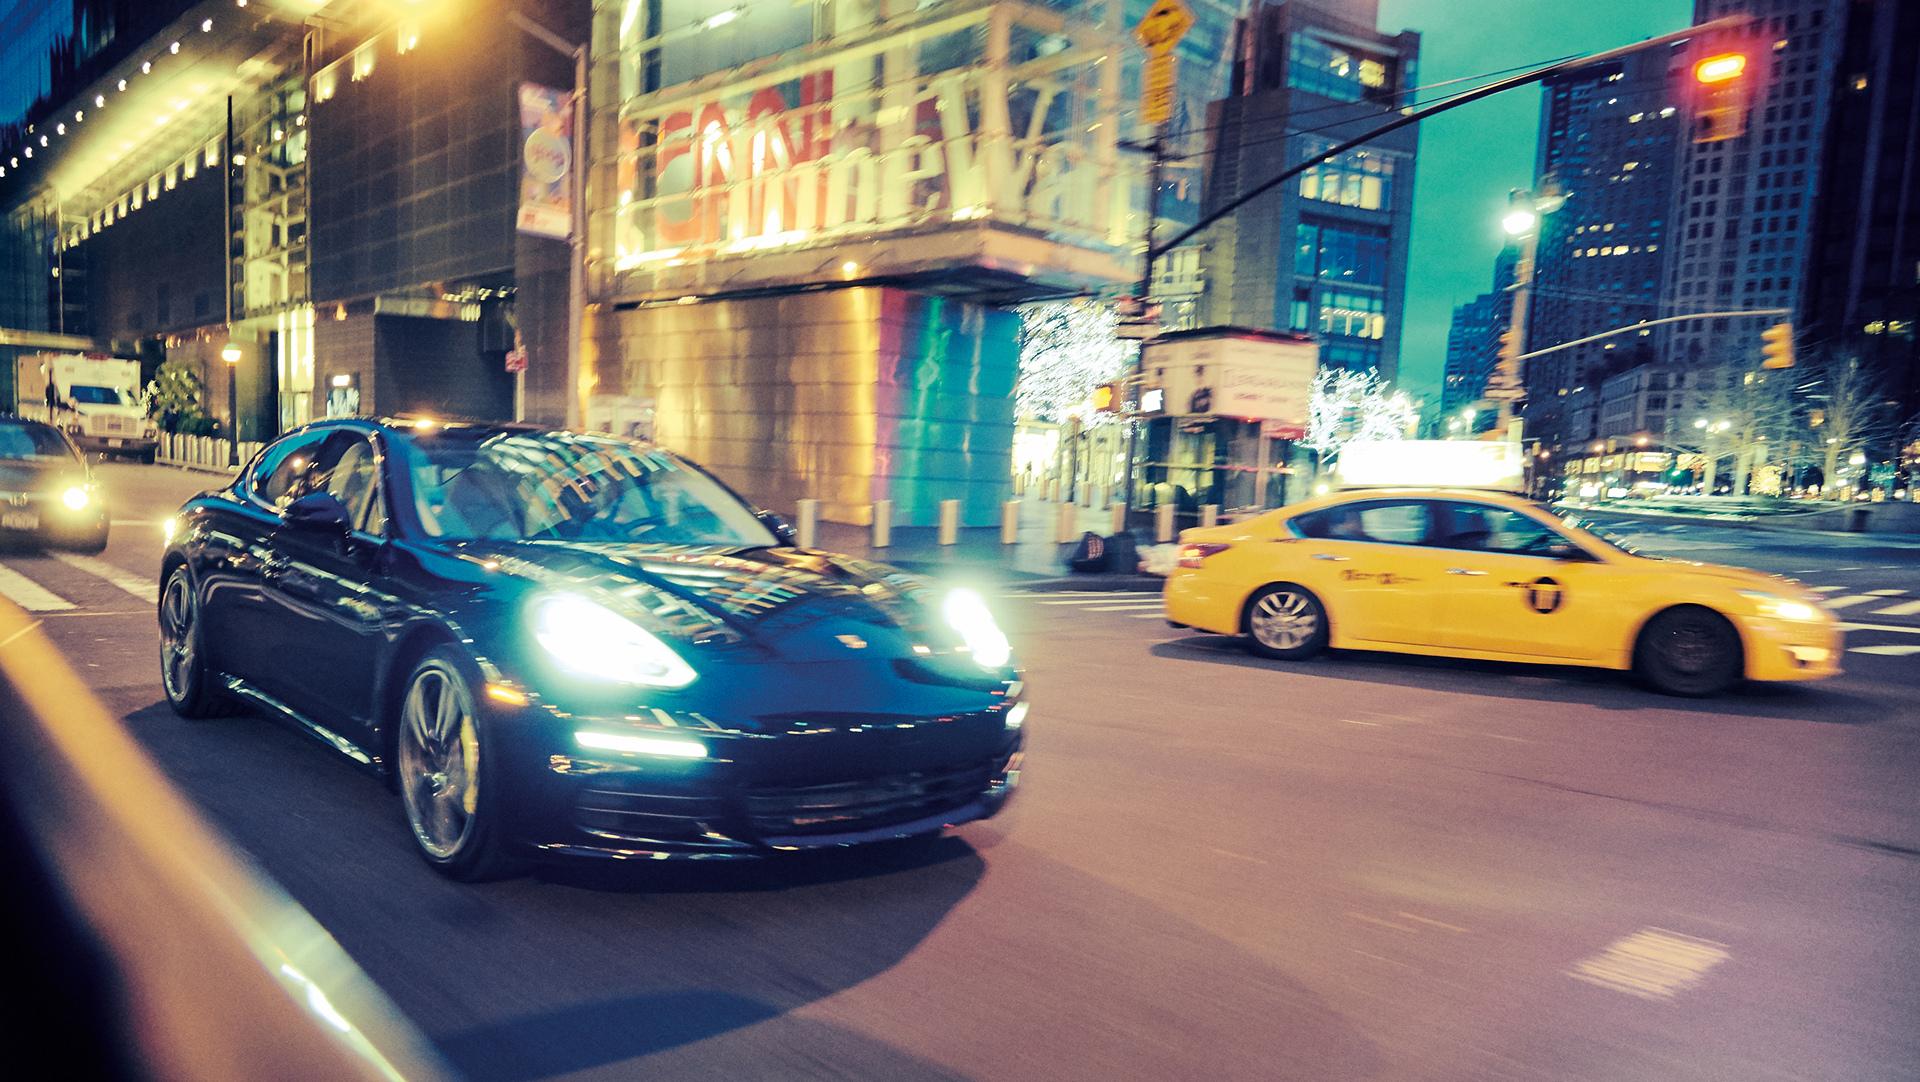 Panamera S E-Hybrid © Dr. Ing. h.c. F. Porsche AG